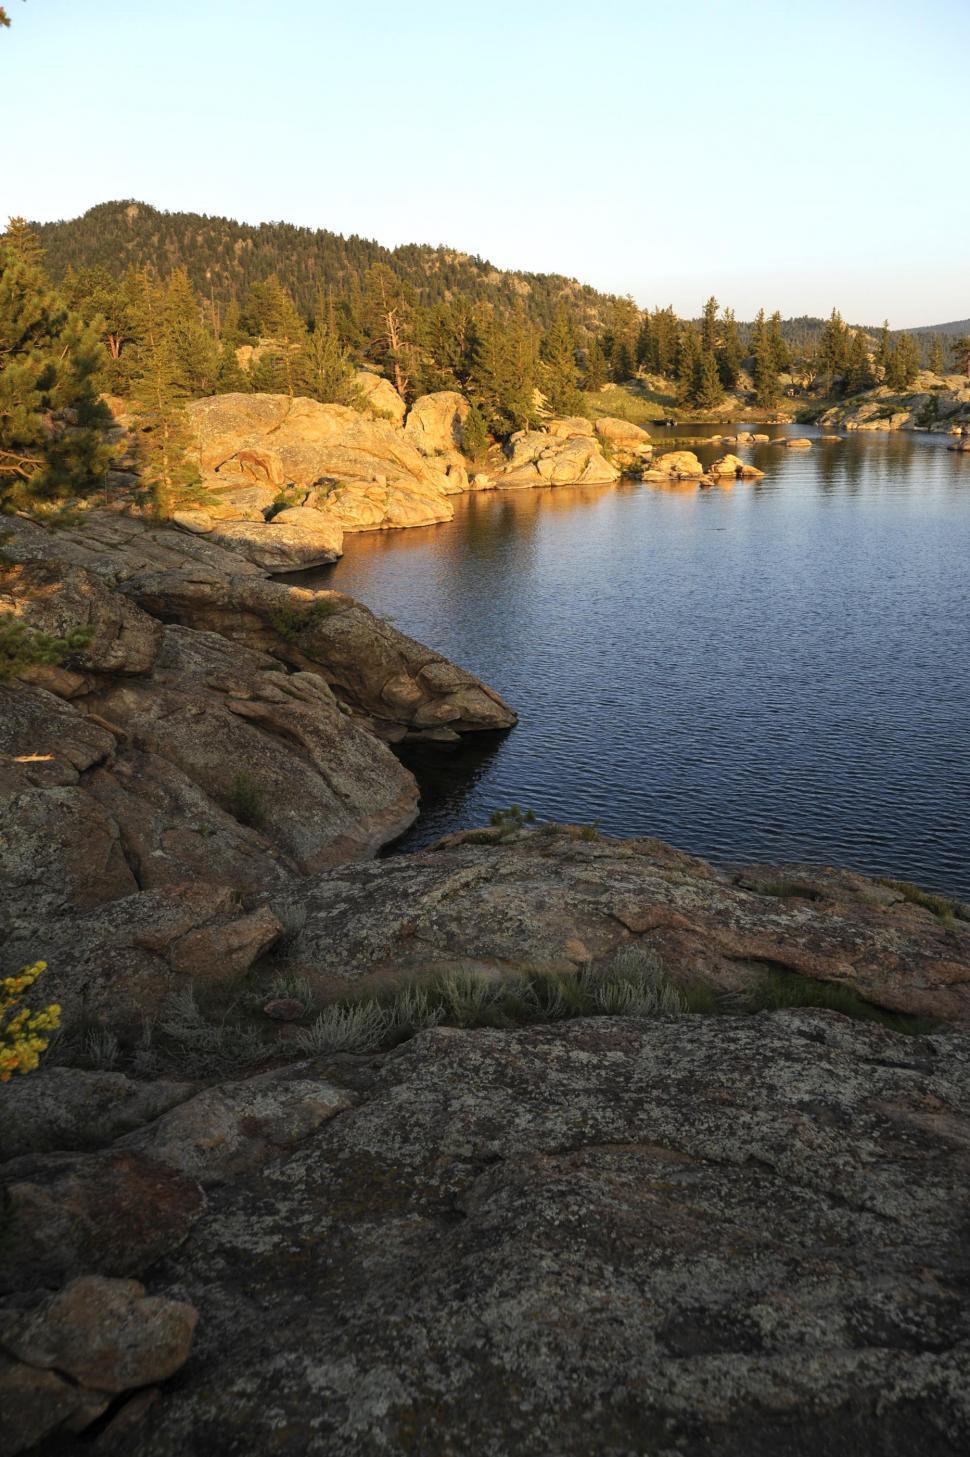 Download Free Stock HD Photo of Shoreline  Online